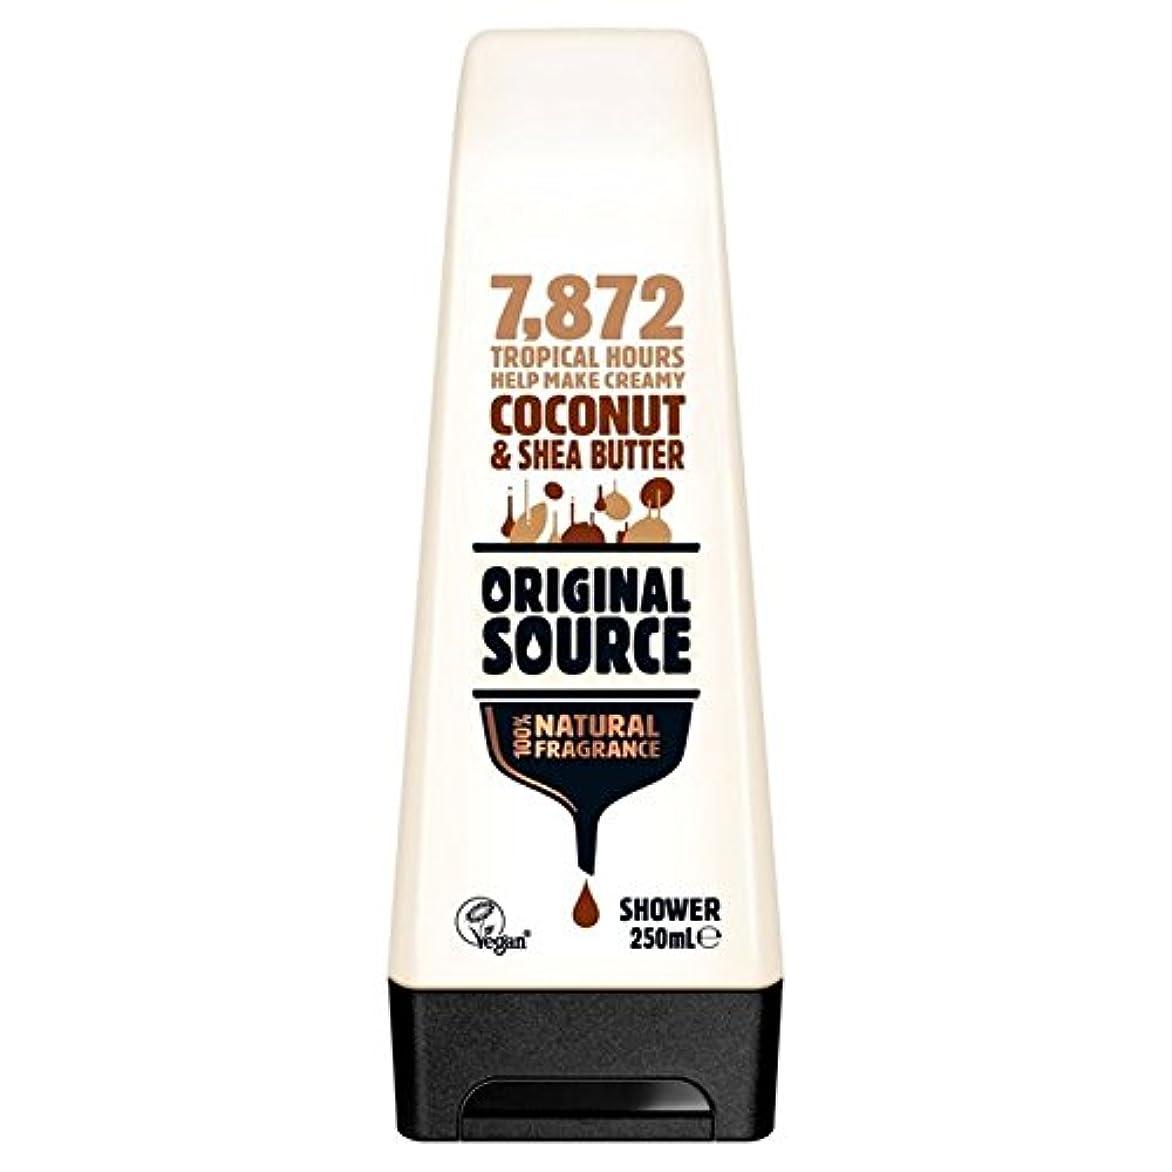 Original Source Moisturising Coconut & Shea Butter Shower Gel 250ml (Pack of 6) - 元のソース保湿ココナッツ&シアバターシャワージェル250...